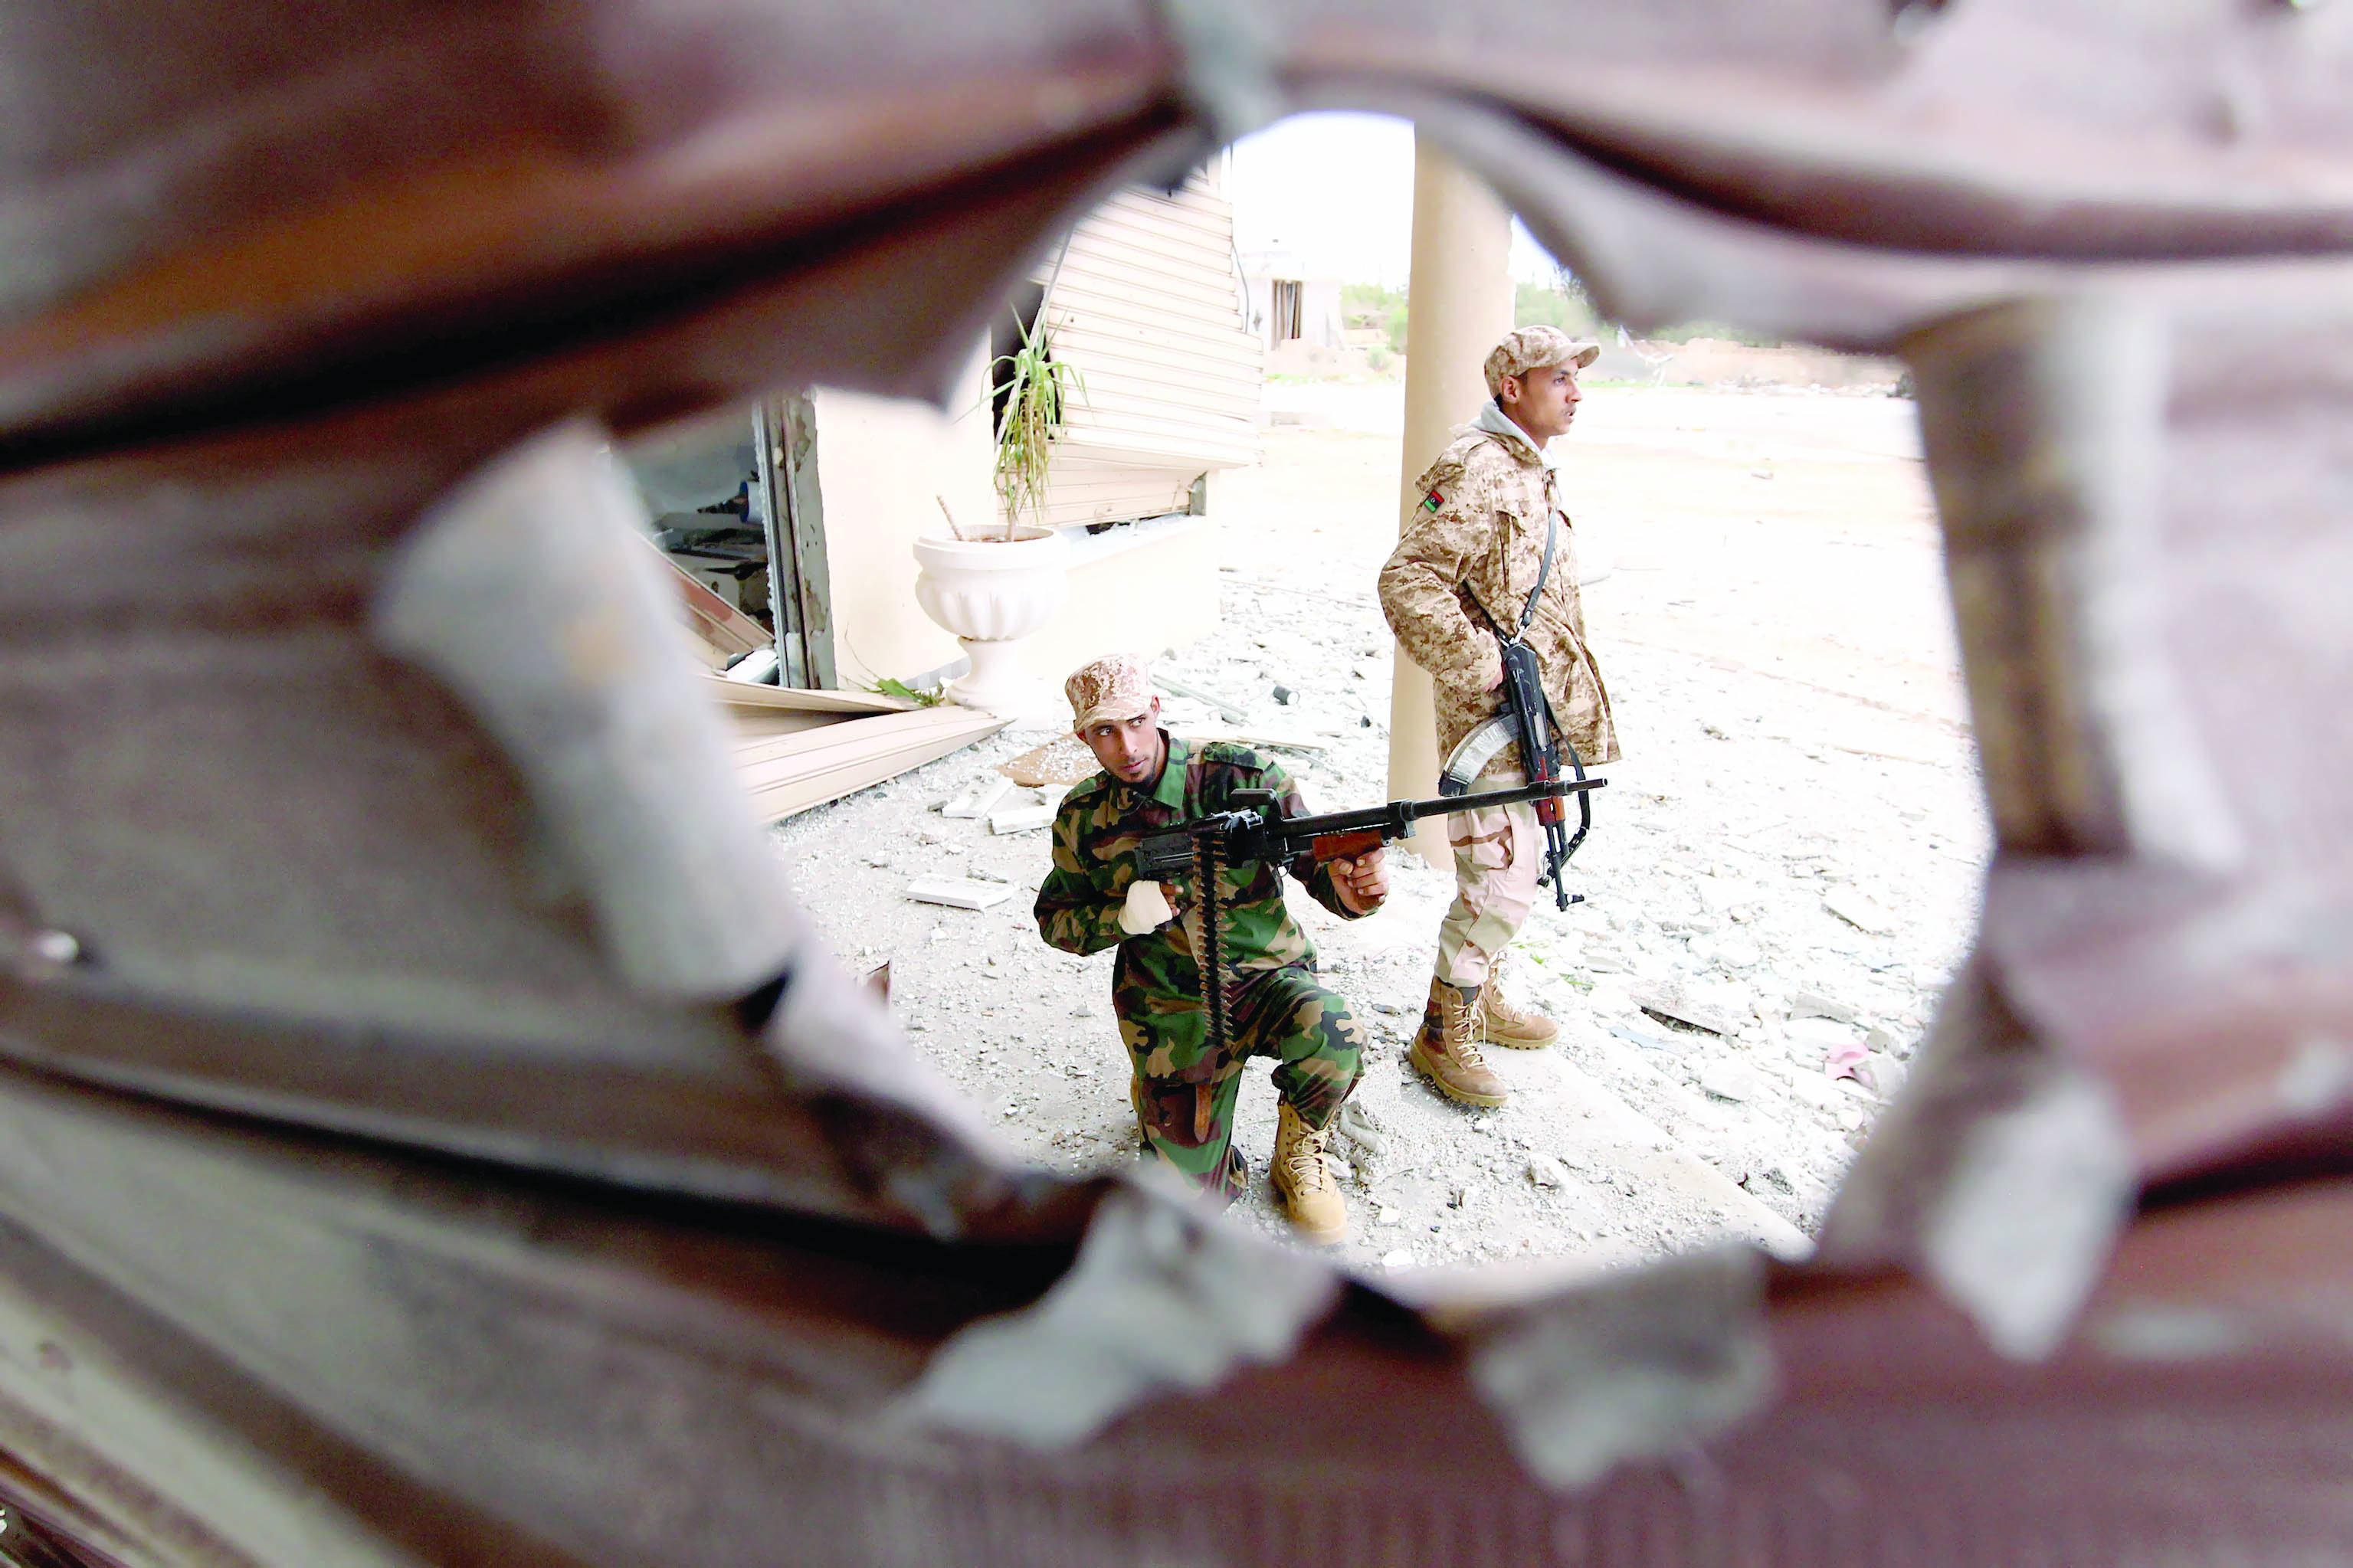 خسائر داعش في ليبيا تتعاظم